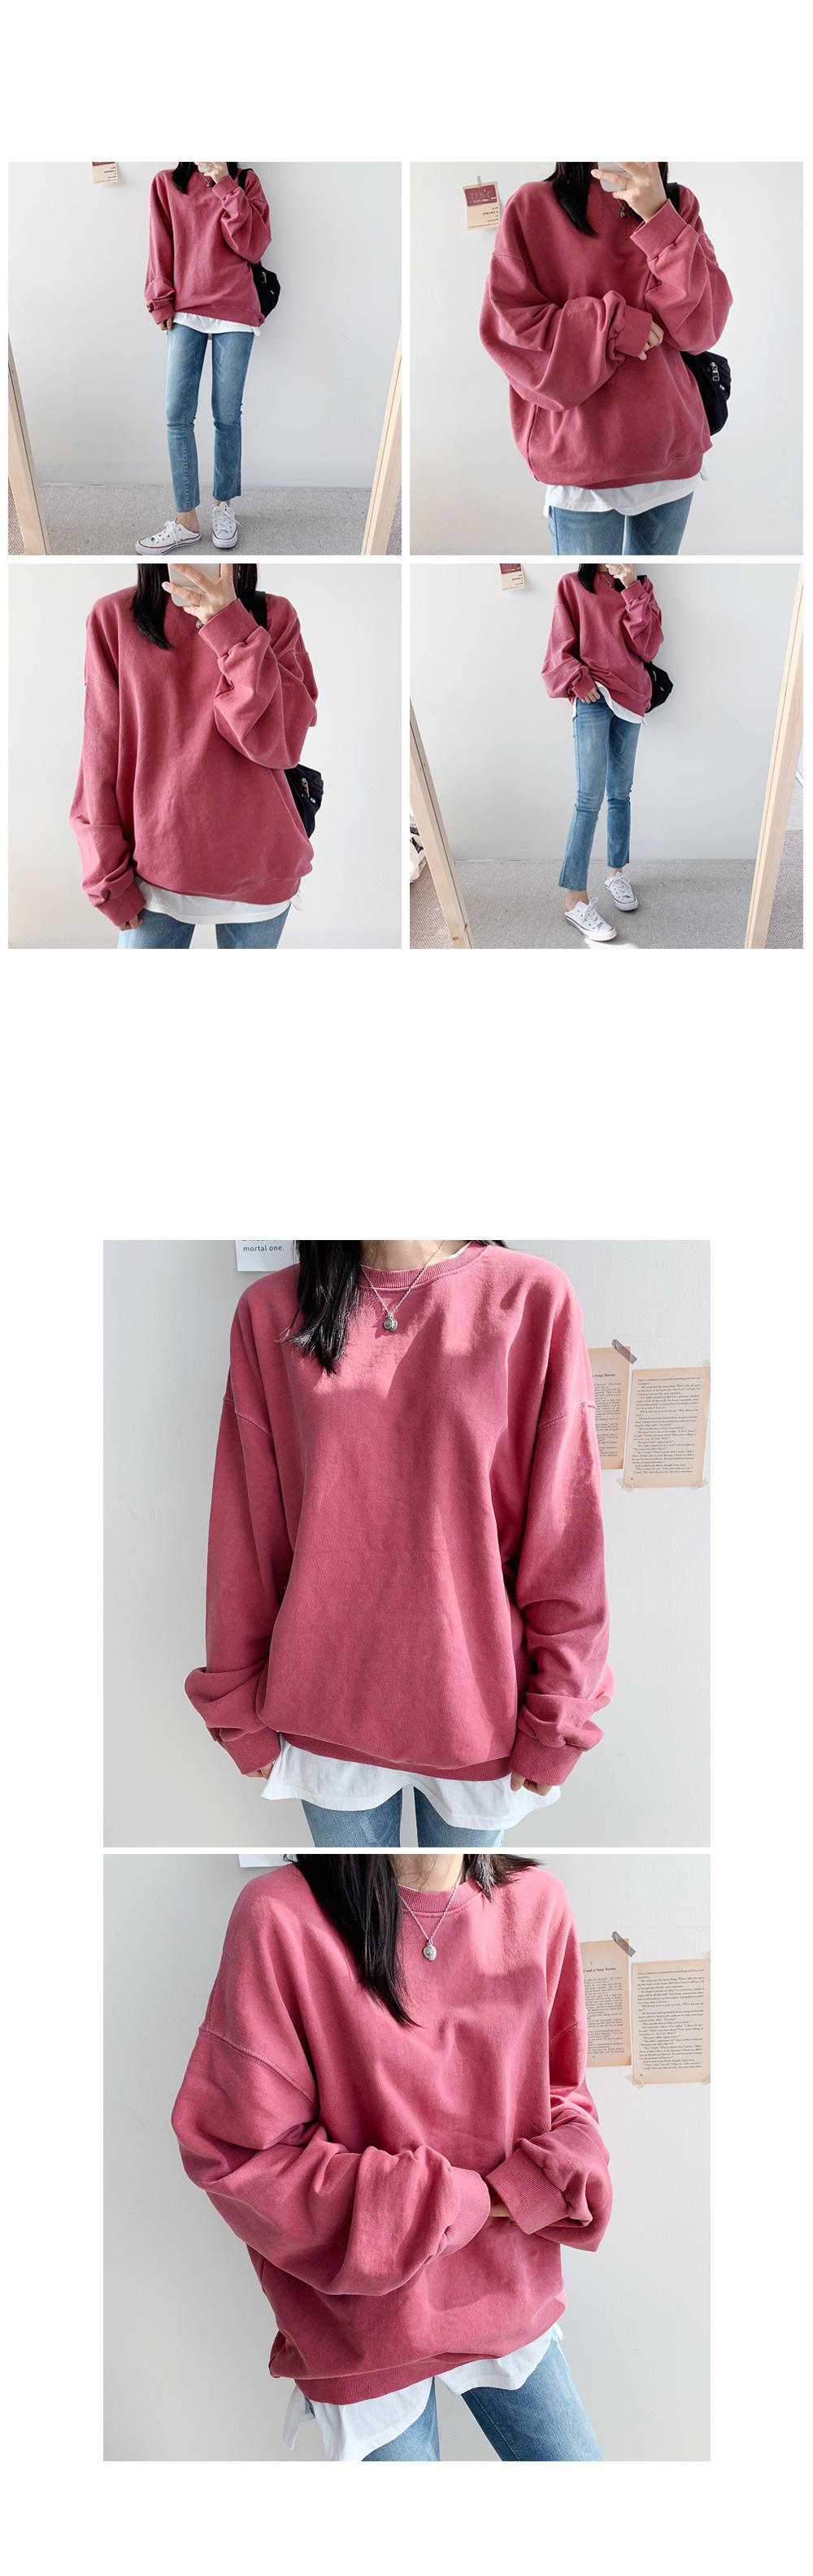 Pipi Pigment sweat shirt